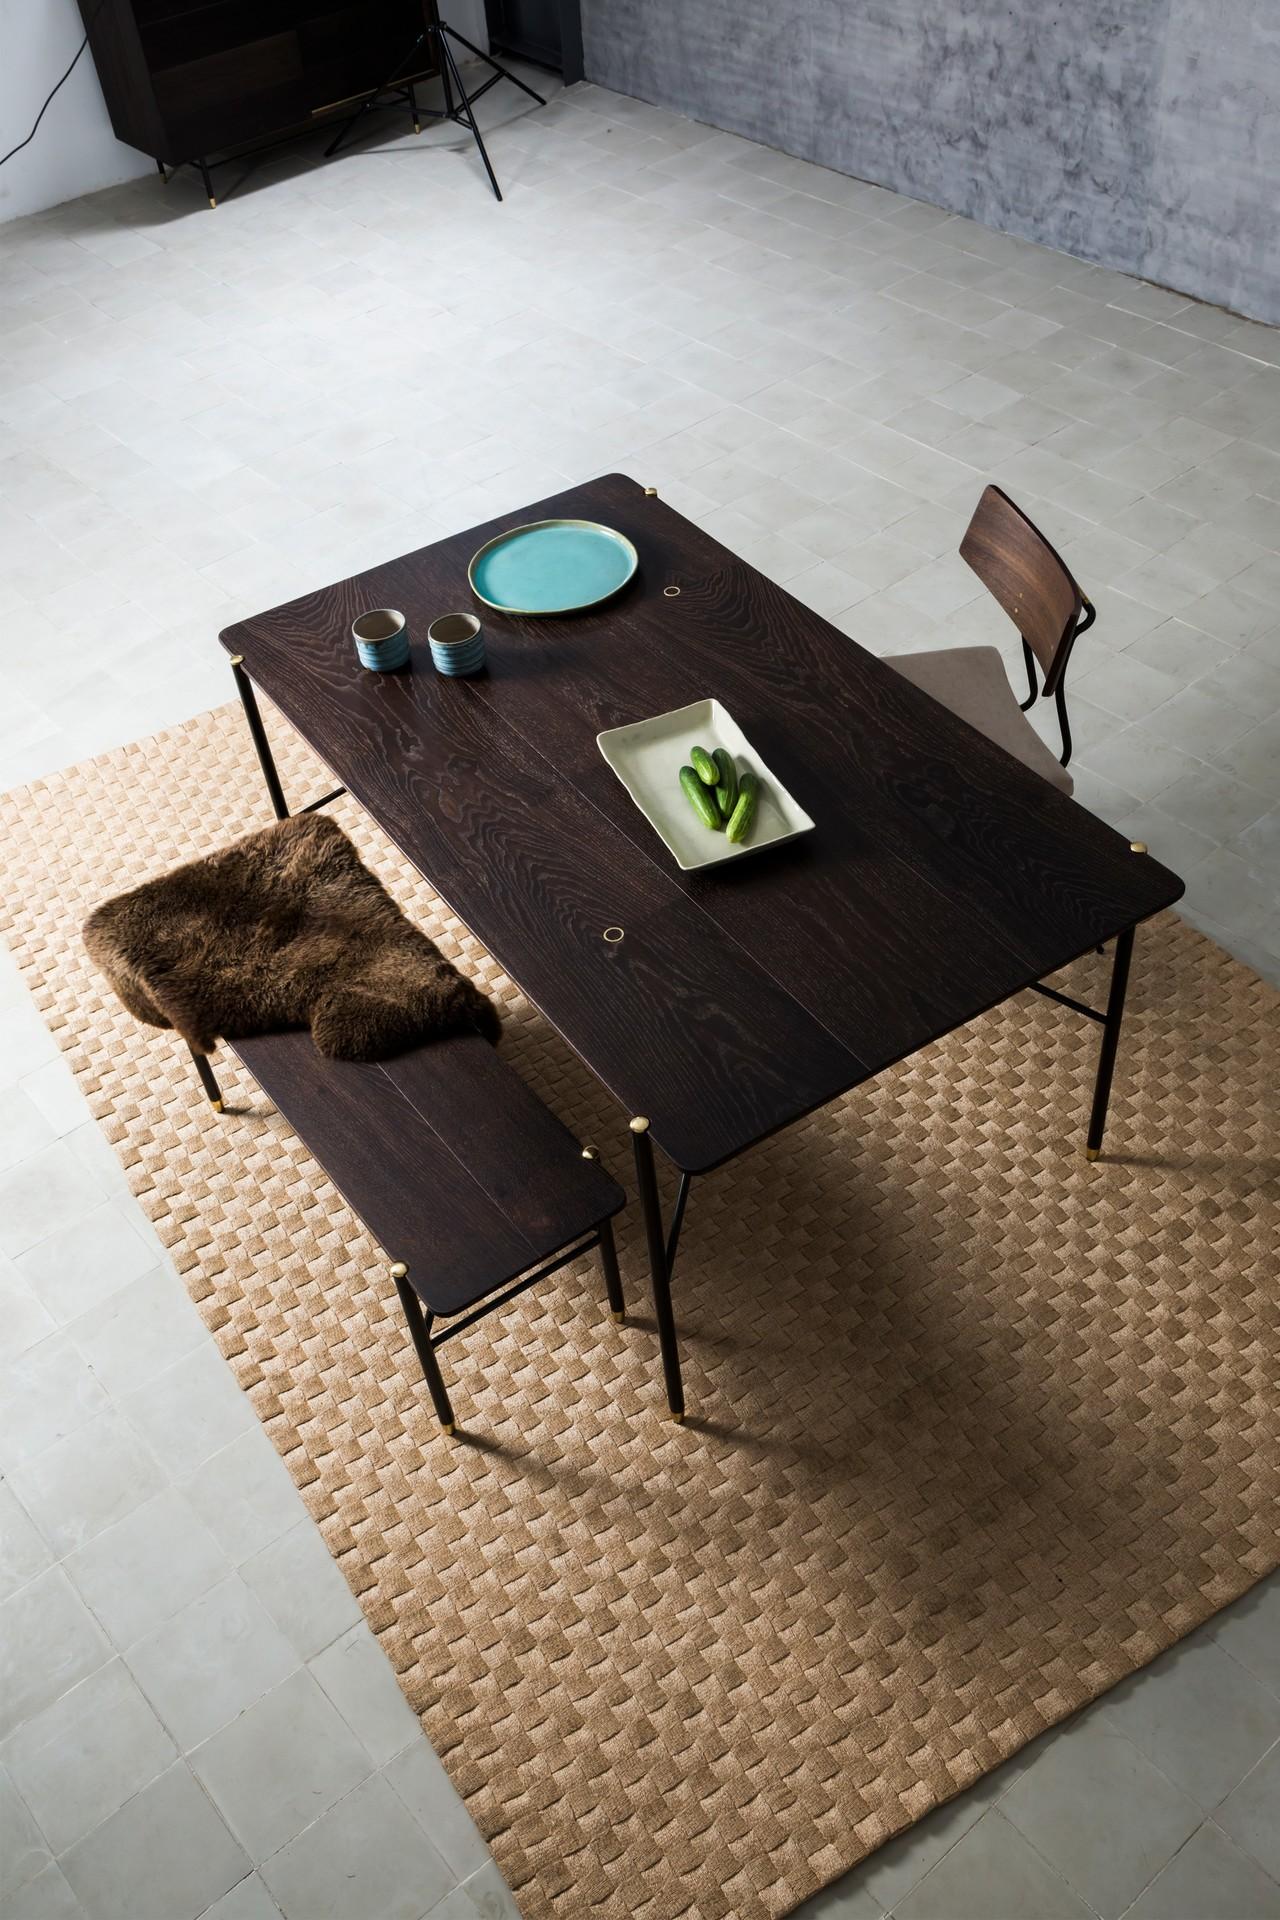 <b>CHIARA <br><br> 엣지 그대로를 살린 마감이 인상적인 테이블로 세련된 인더스트리얼 스타일을 완성하는 데 최적화된 제품이다.   모던하면서도 혁신적인 디자인으로 스타일리쉬한 공간을 분들에게 사랑받고 있다.